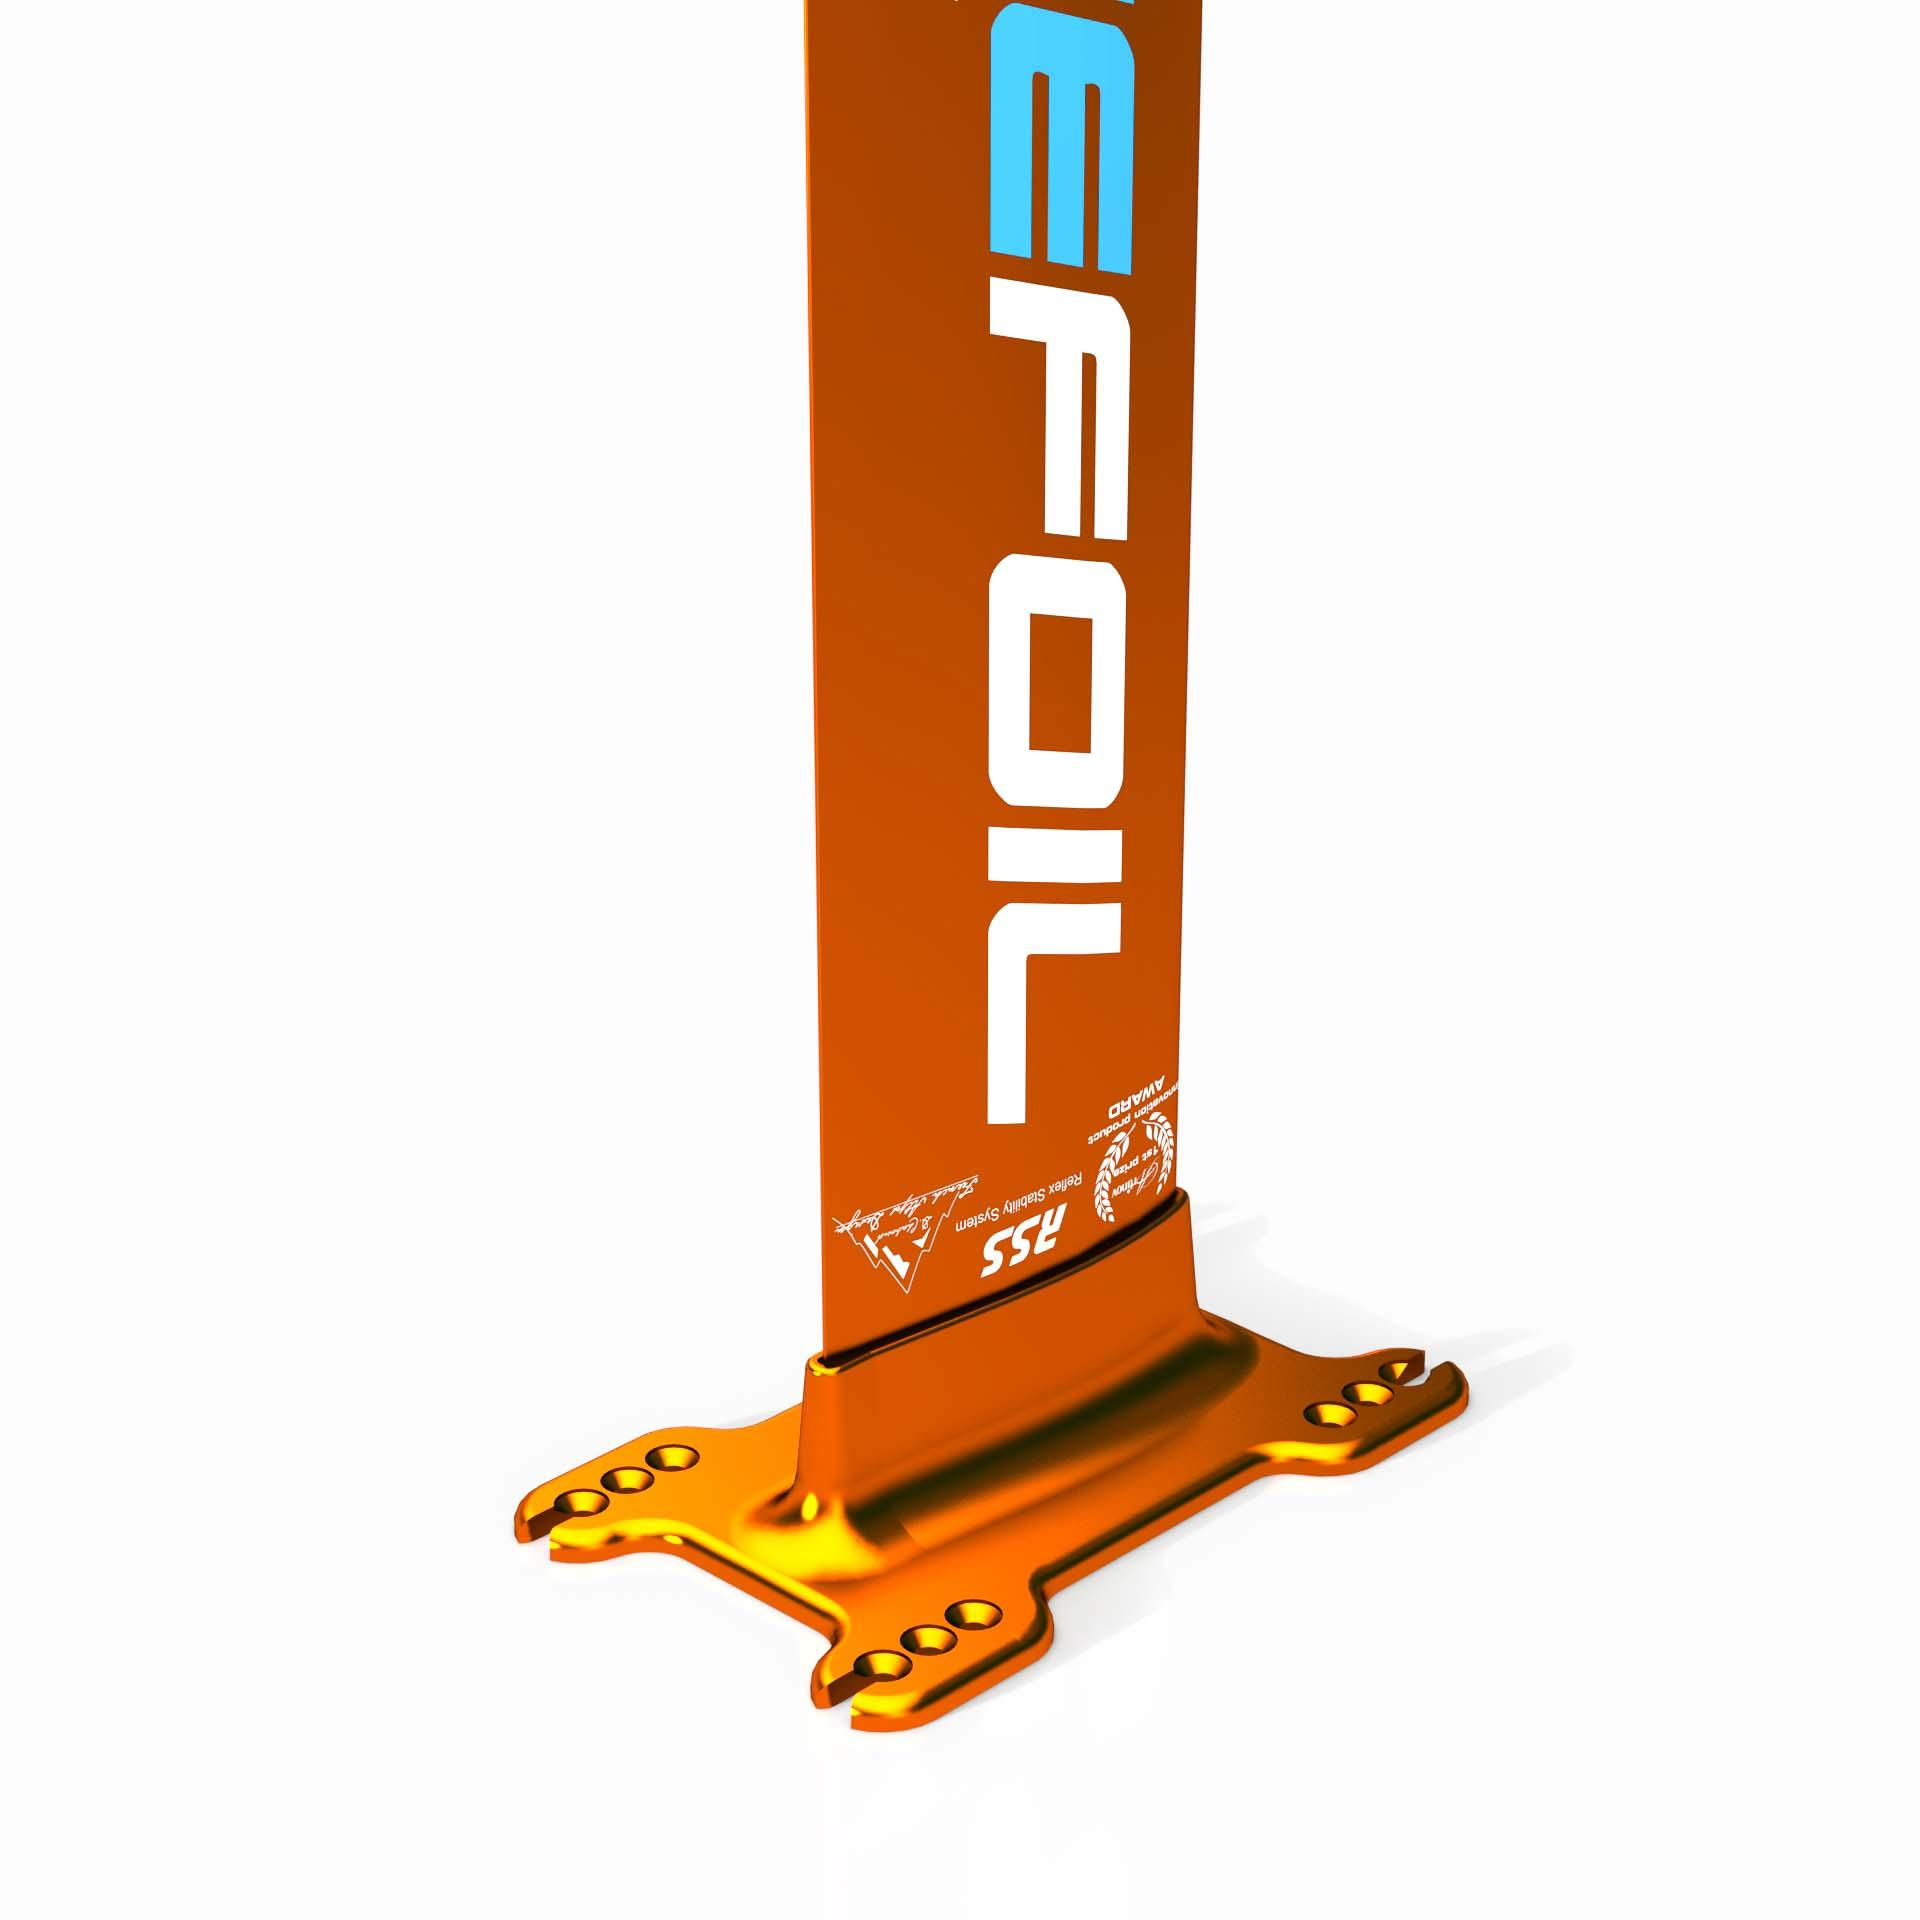 Kitefoil alpinefoil ezee 1000 14